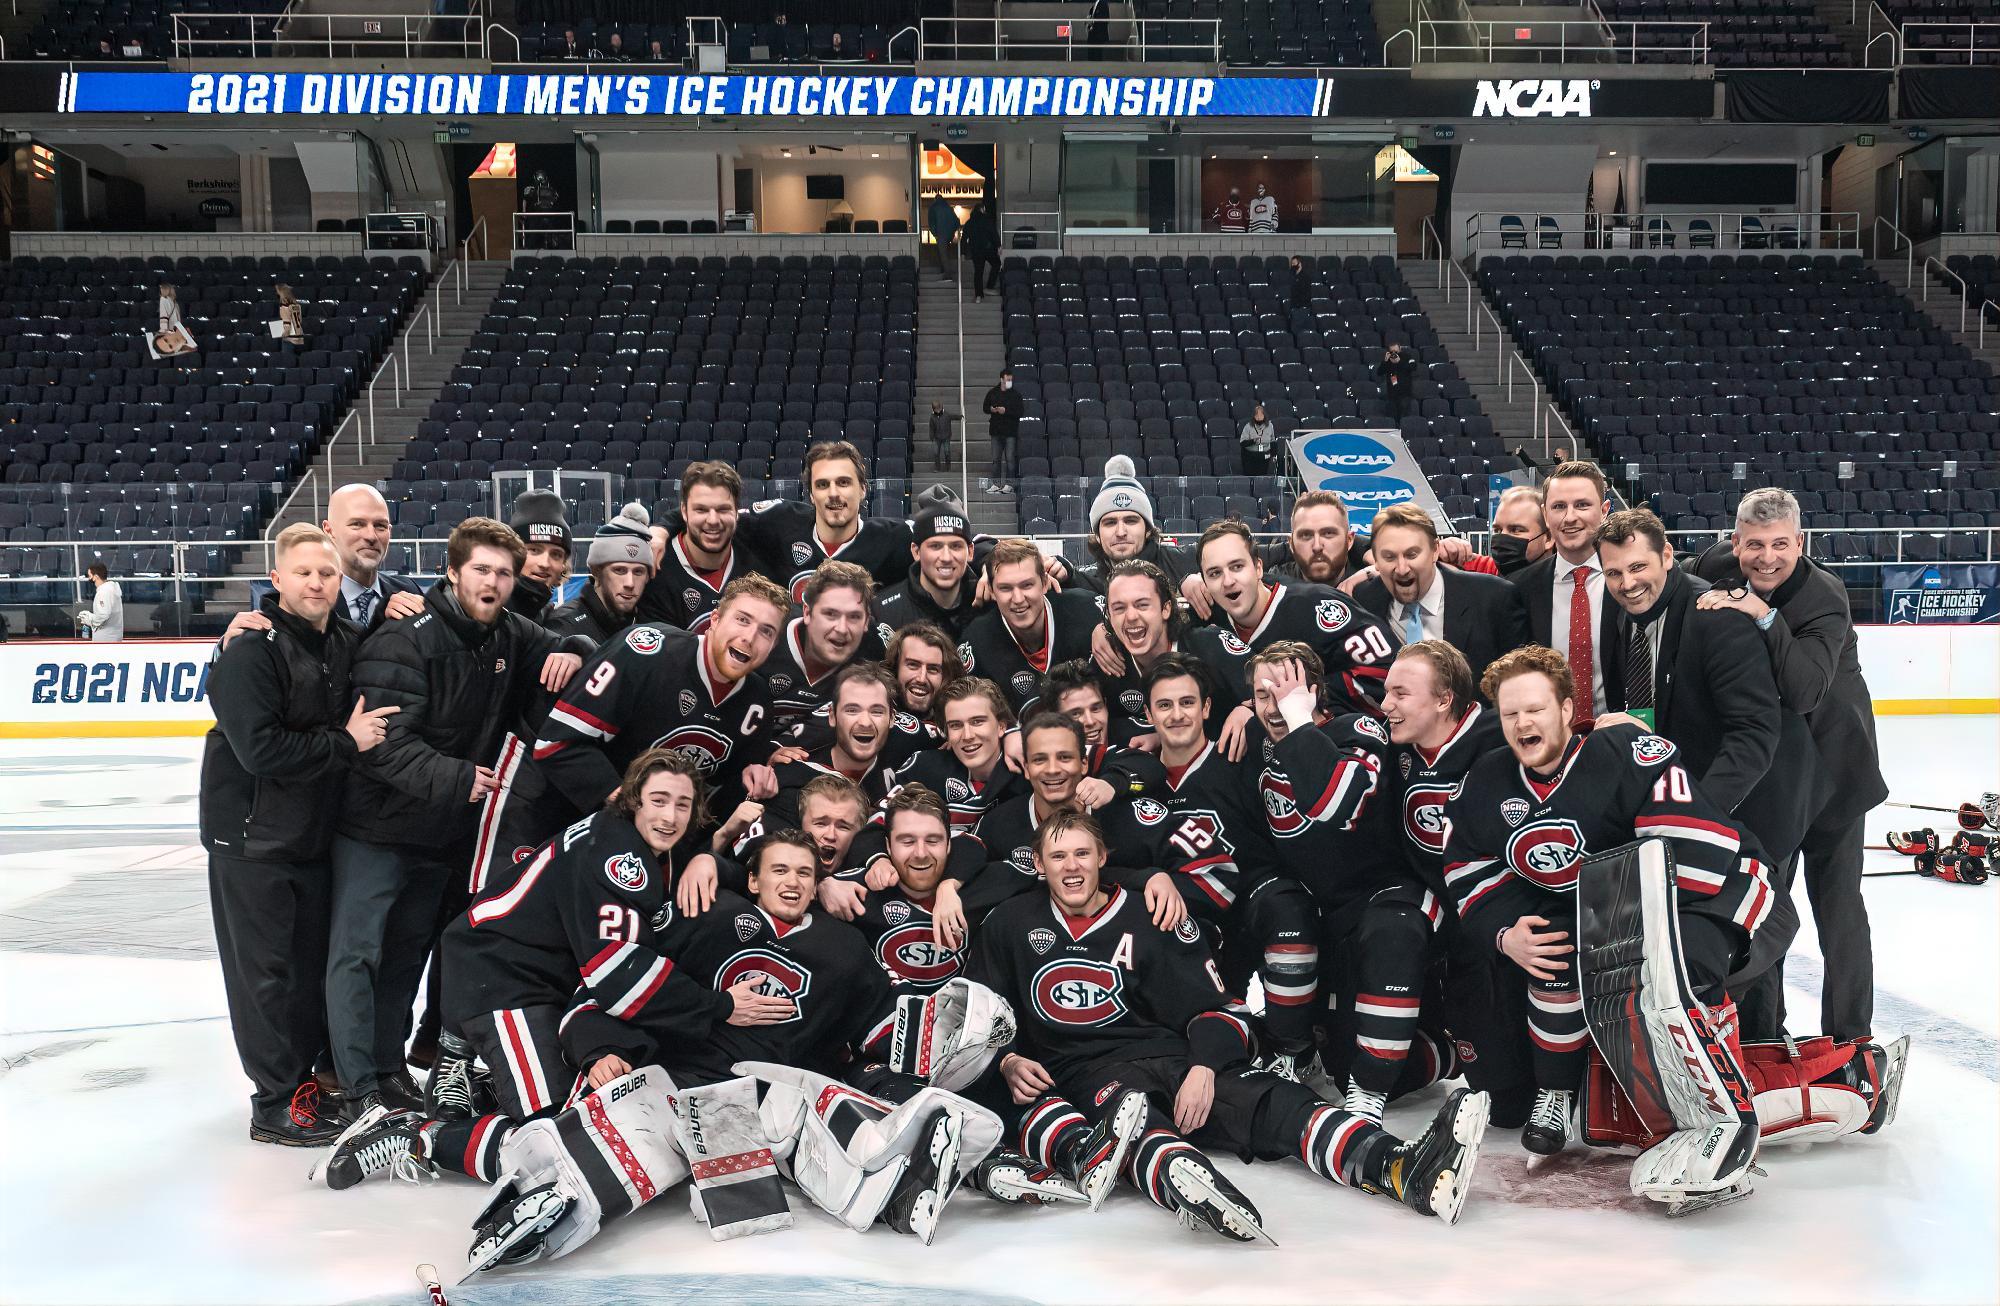 St Cloud State Wins Trip To Ncaa Hockey Frozen Four For Injured Brodzinski The Daily Gazette